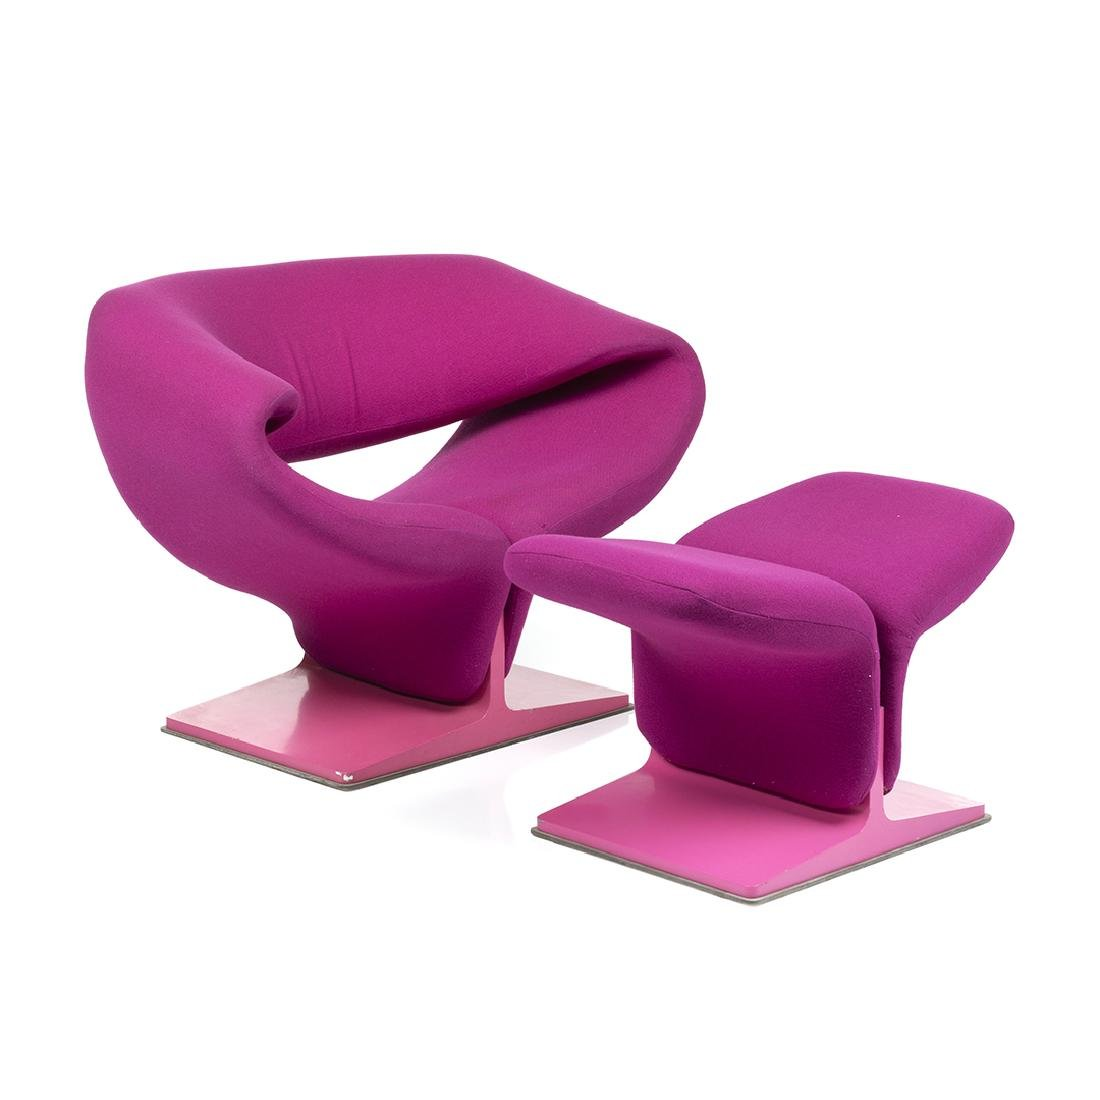 Pierre Paulin Ribbon Chair and Ottoman (2)